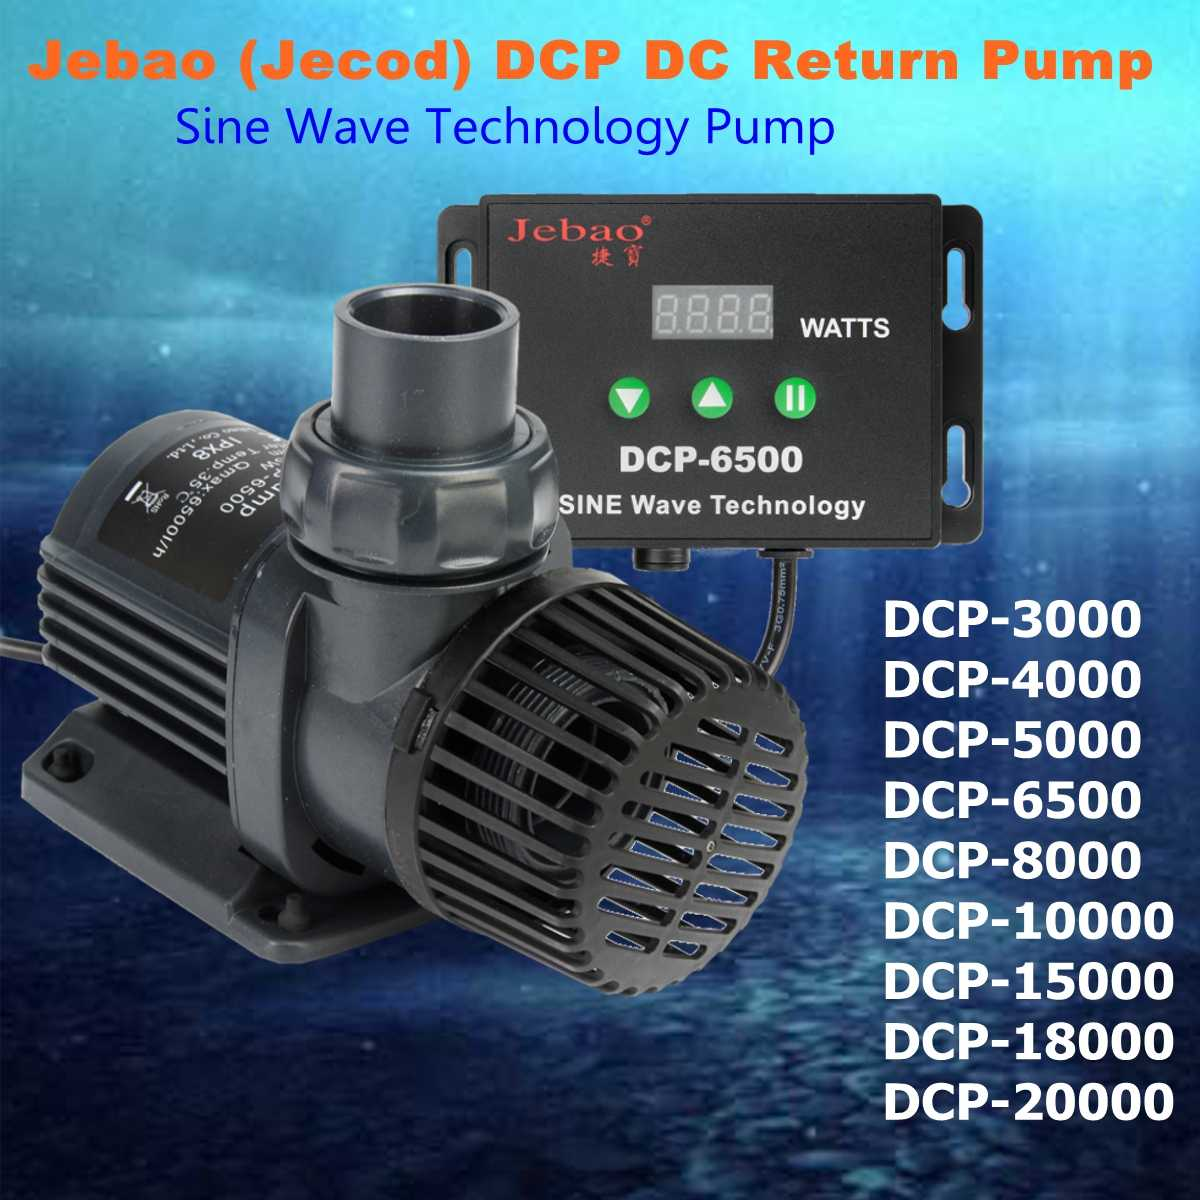 Jebao/Jecod serie DCP 3500-20000 Maring flujo DC Sine Wave Return bomba de agua SUMERGIBLE